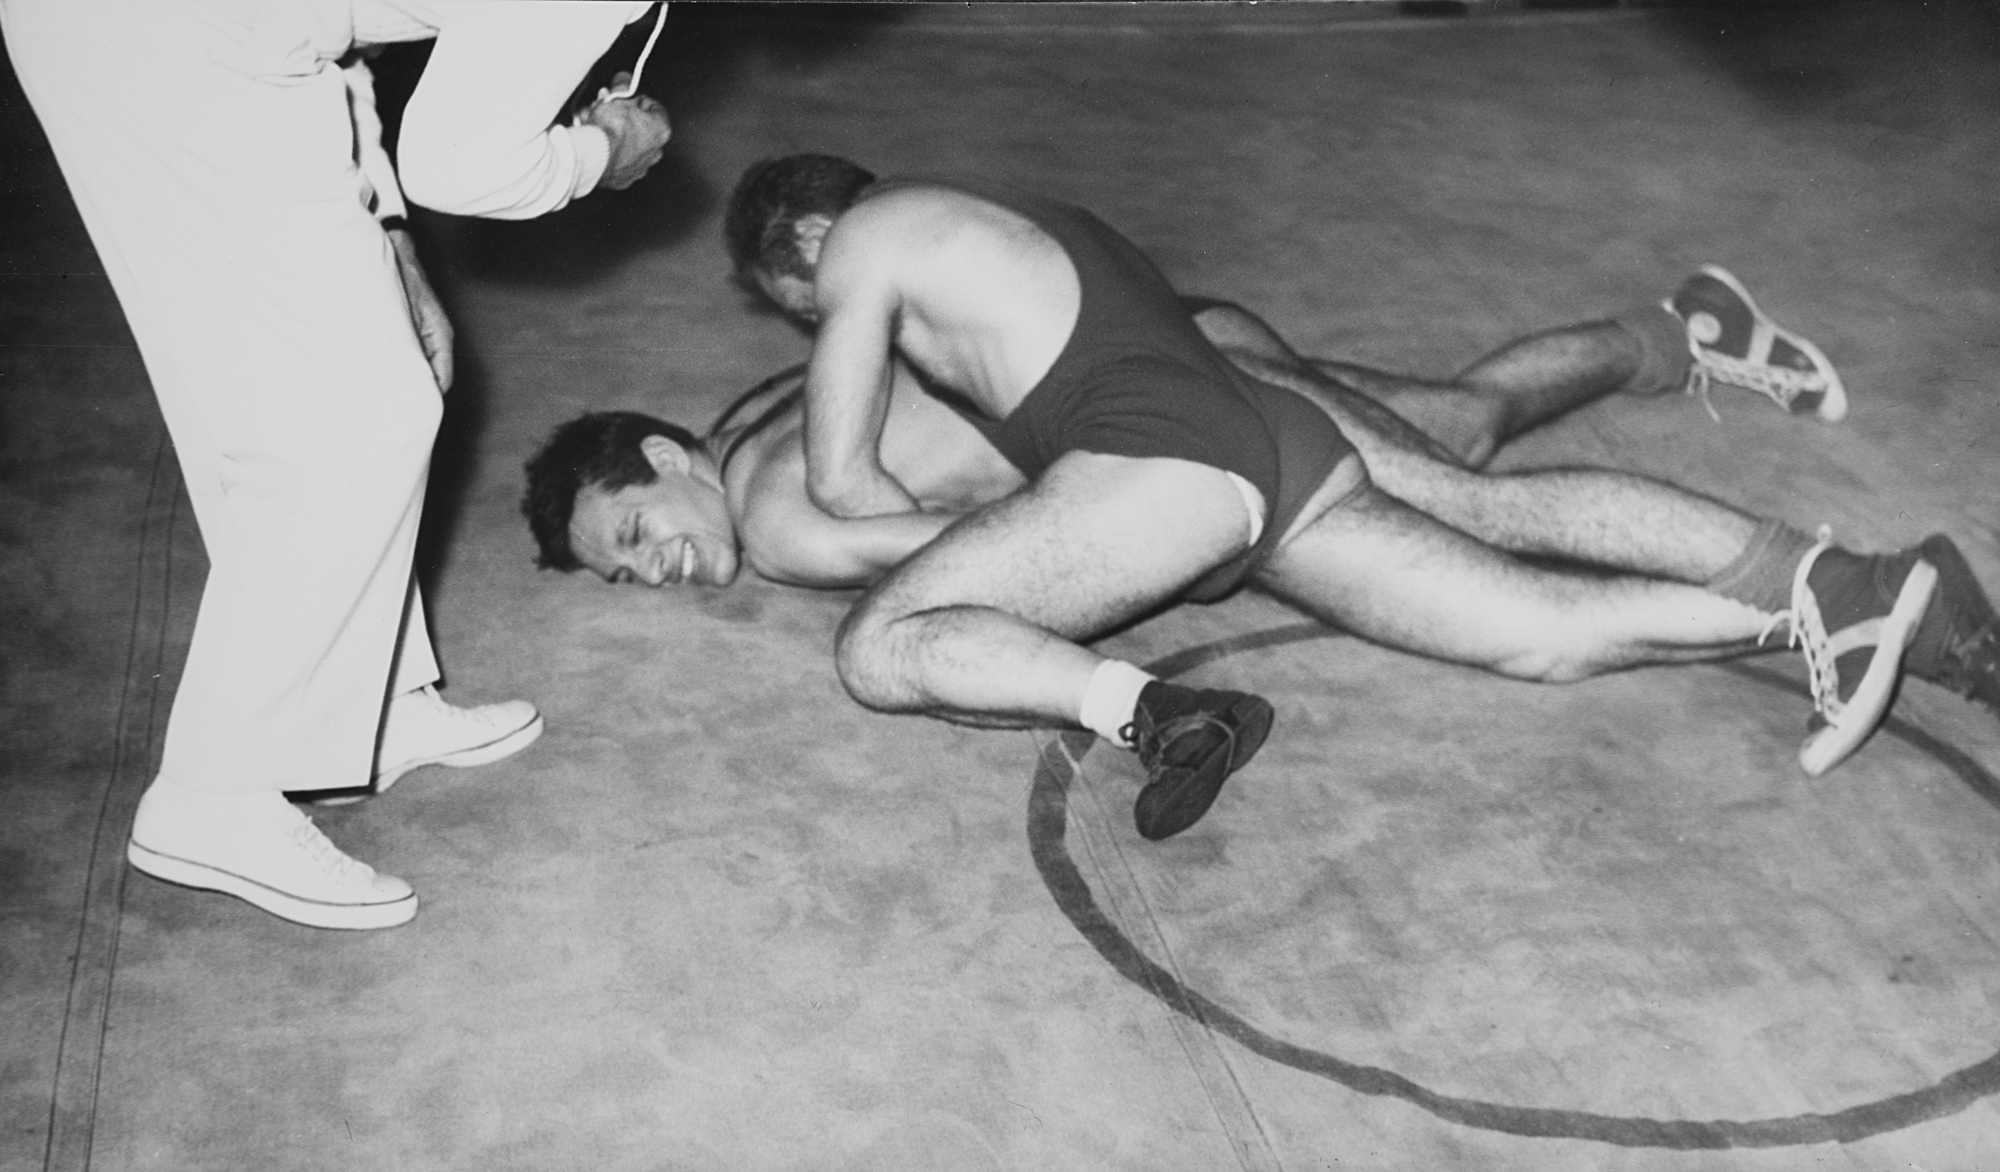 Difesa di terra e presa di manichetto e cintura, anni 1960